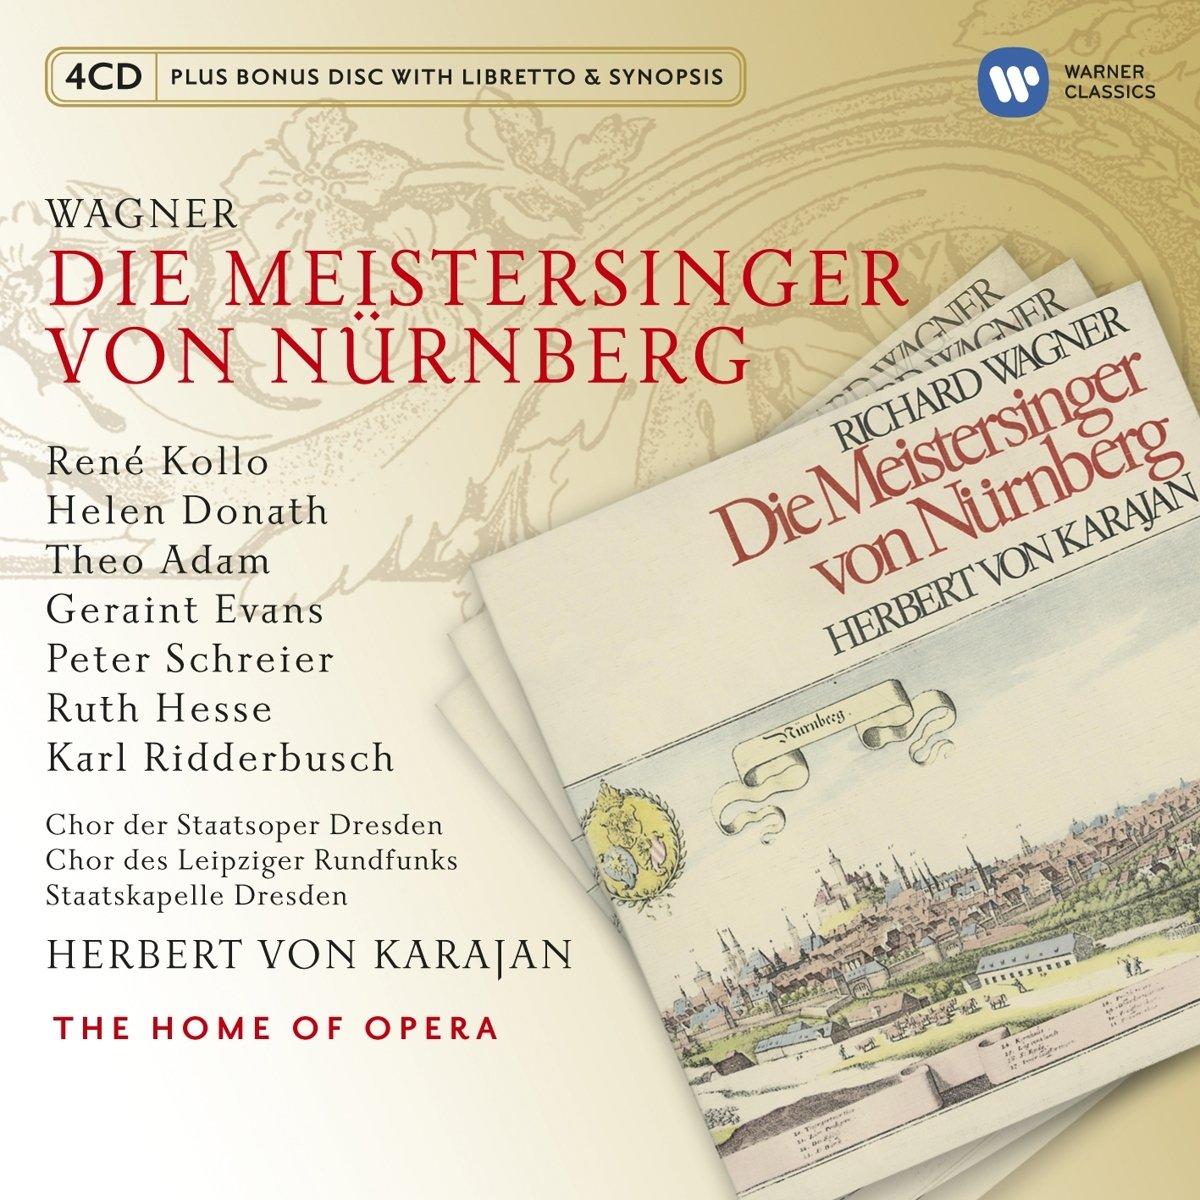 Die Meistersinger Von Nürnberg - Karajan, Kollo, Donath, Richard Wagner:  Amazon.de: Musik